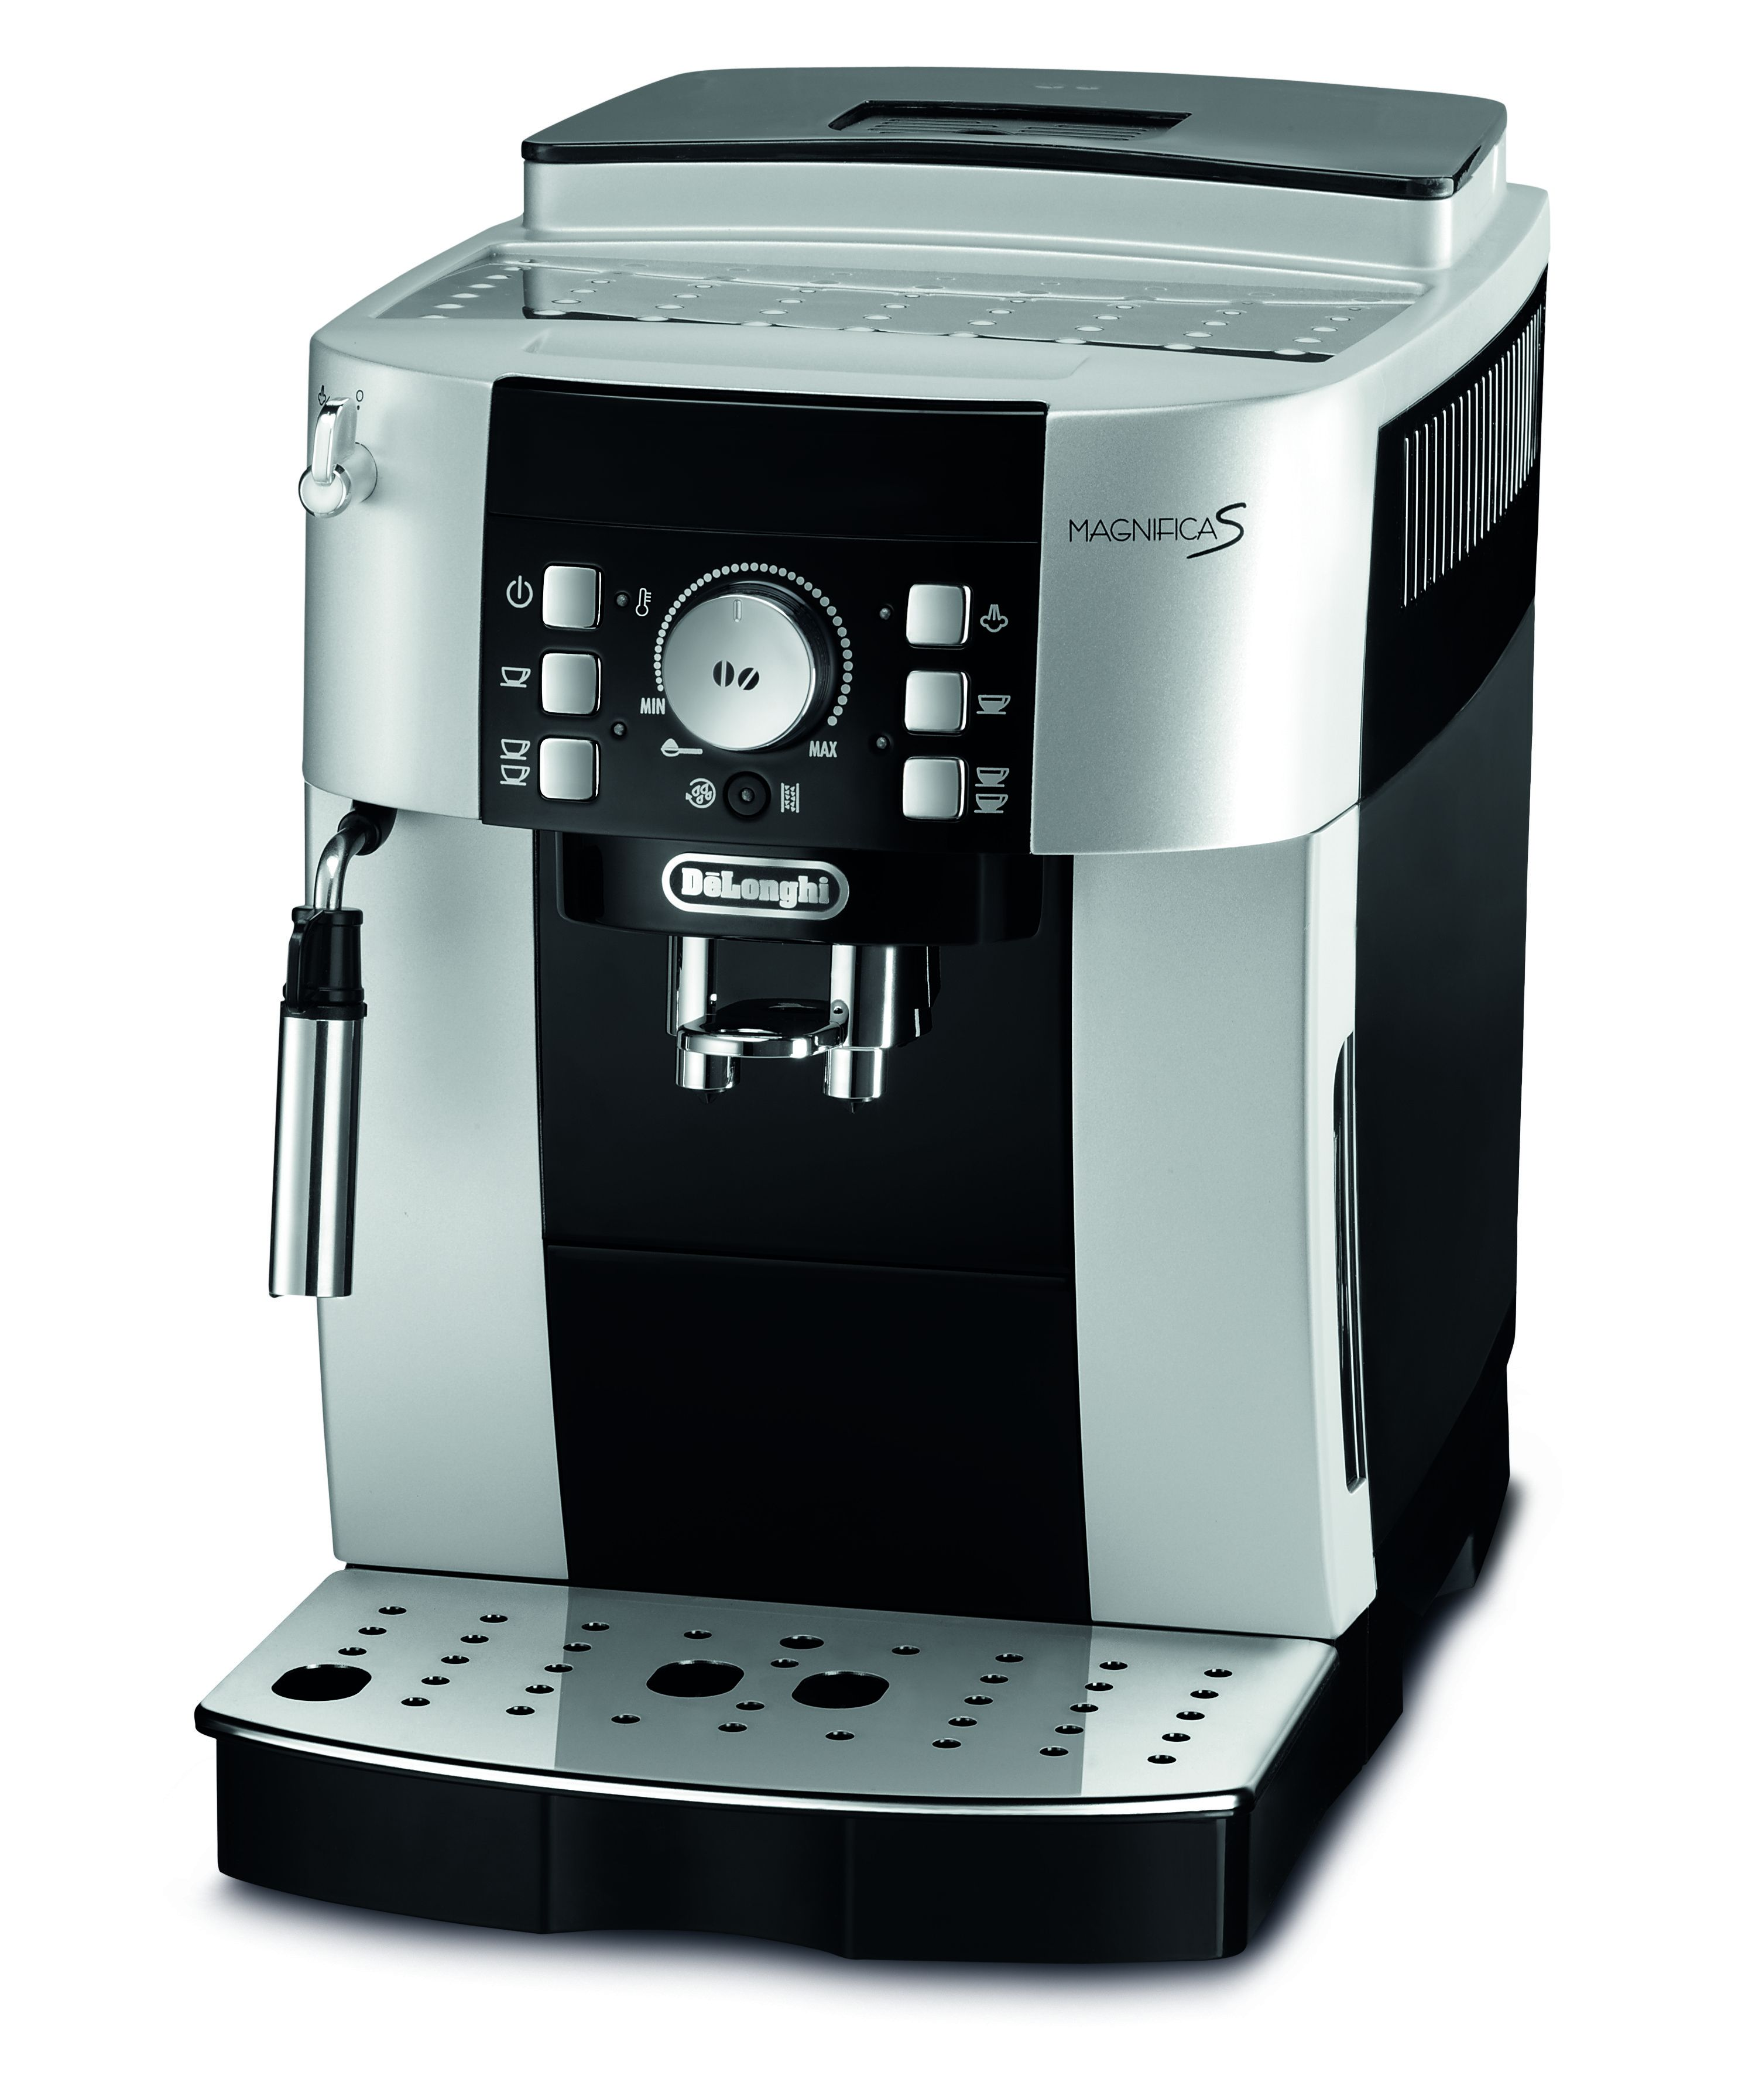 de longhi magnifica s kaffeeautomat f r die espressobar zu hause. Black Bedroom Furniture Sets. Home Design Ideas